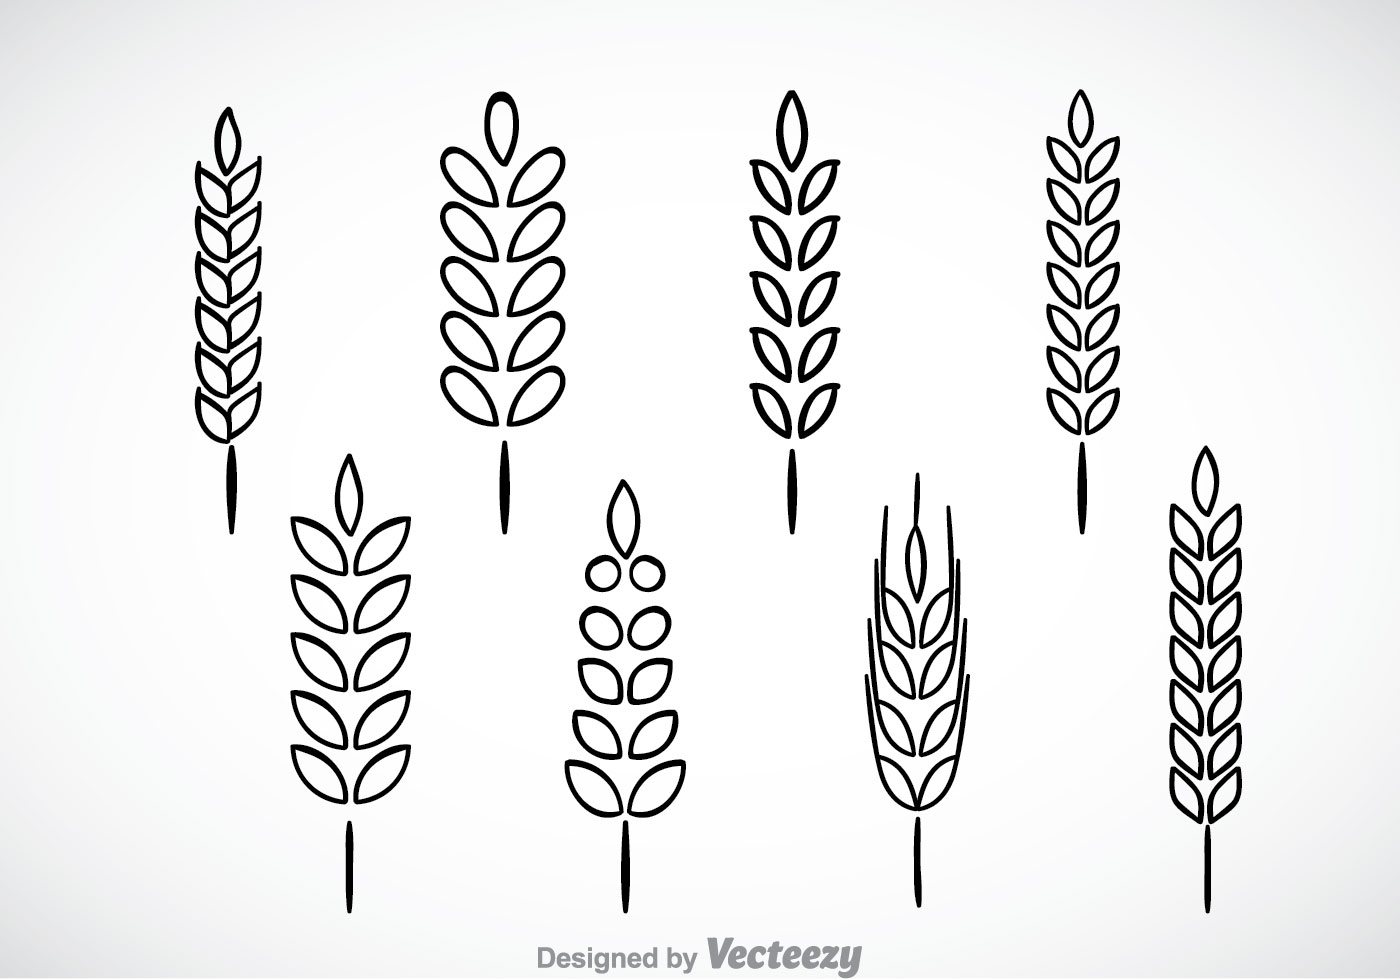 Wheat Stalk Black Outl...